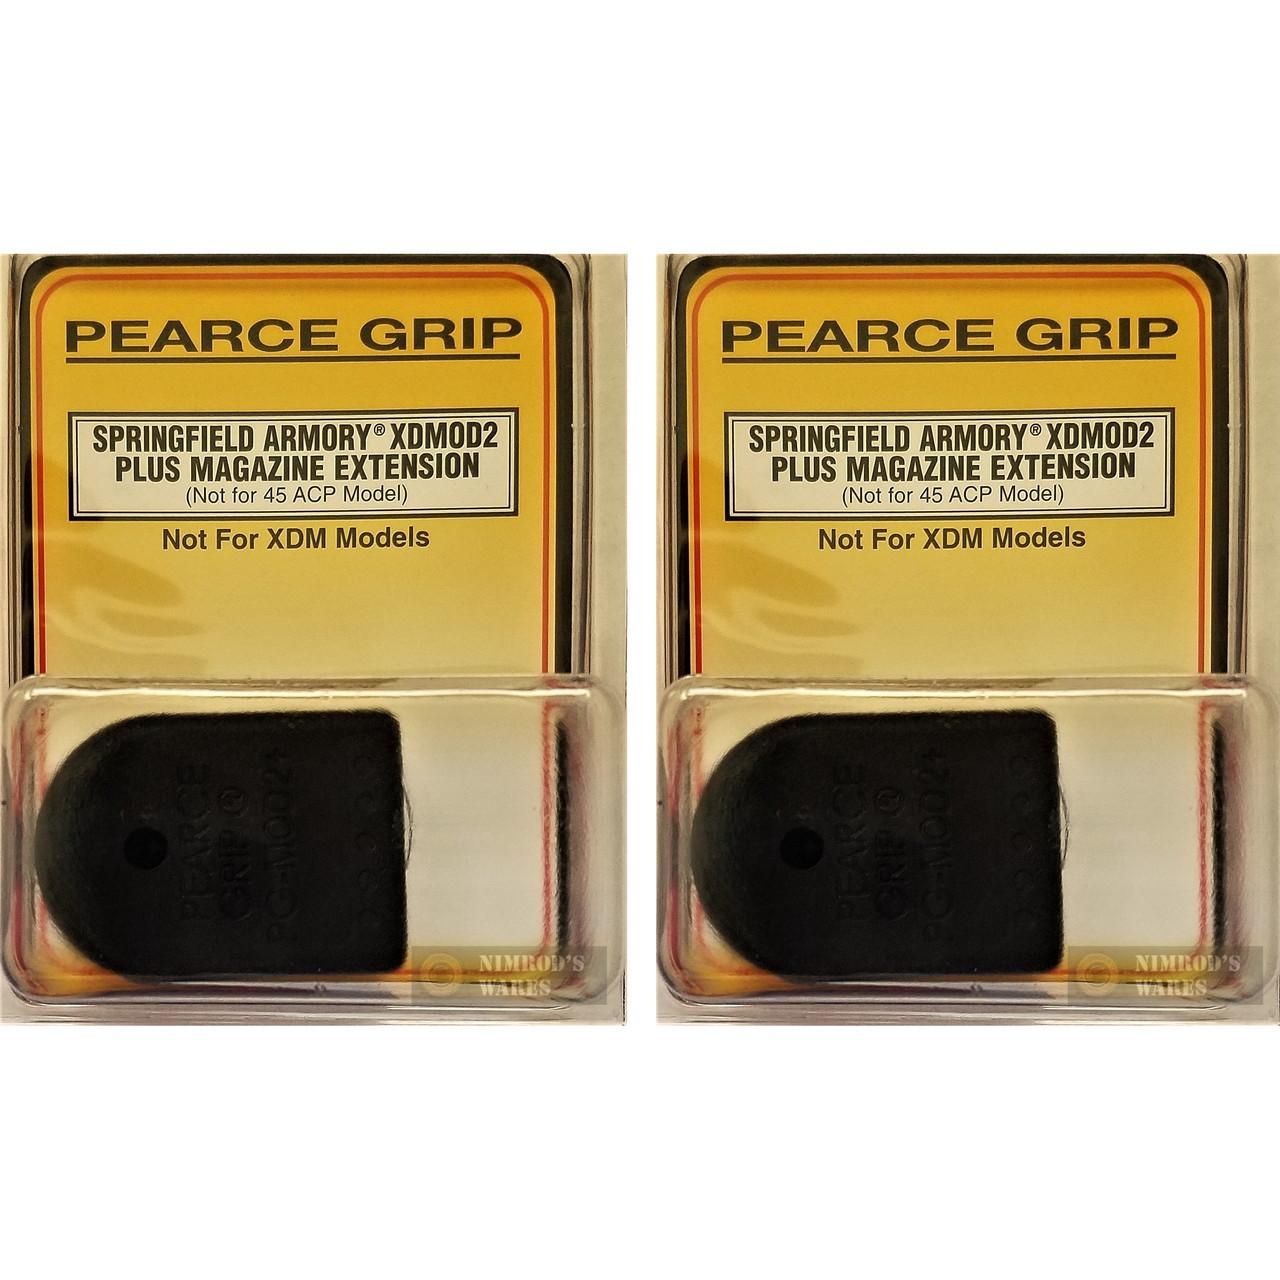 Pearce Grip SPRINGFIELD XD Mod  2 Mod2 Grip Extension PLUS PG-XDMOD2 2-PACK